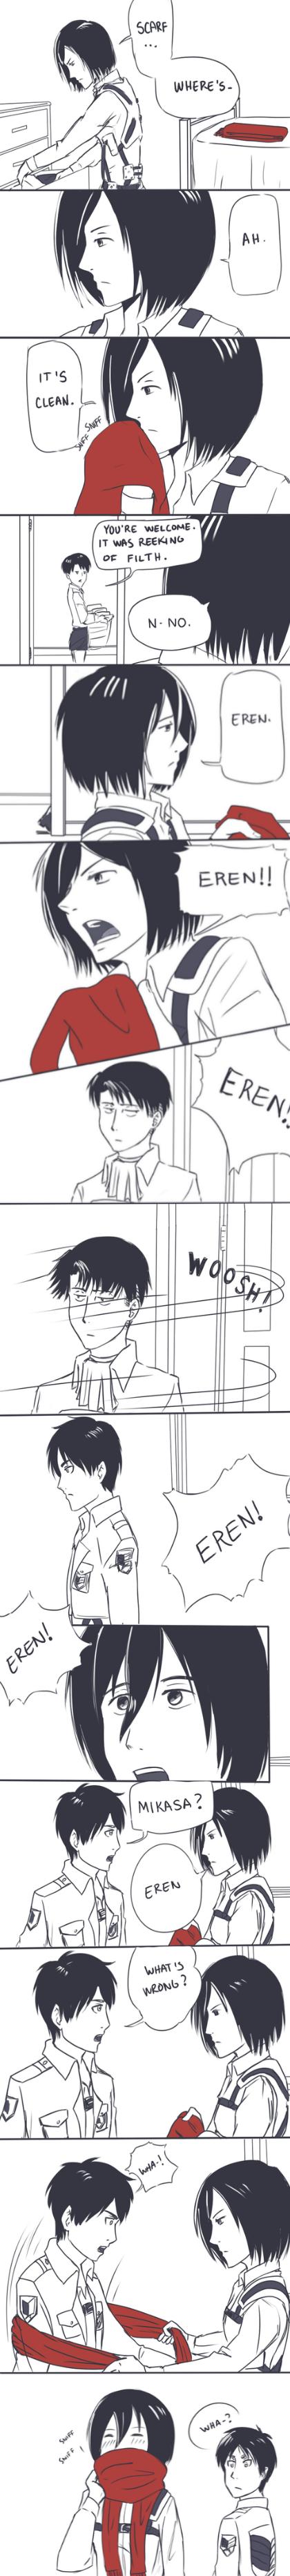 Mikasa's Thirst Is Real. . Shingeki Kyojin titan attack Mikasa Eren Scarf levi